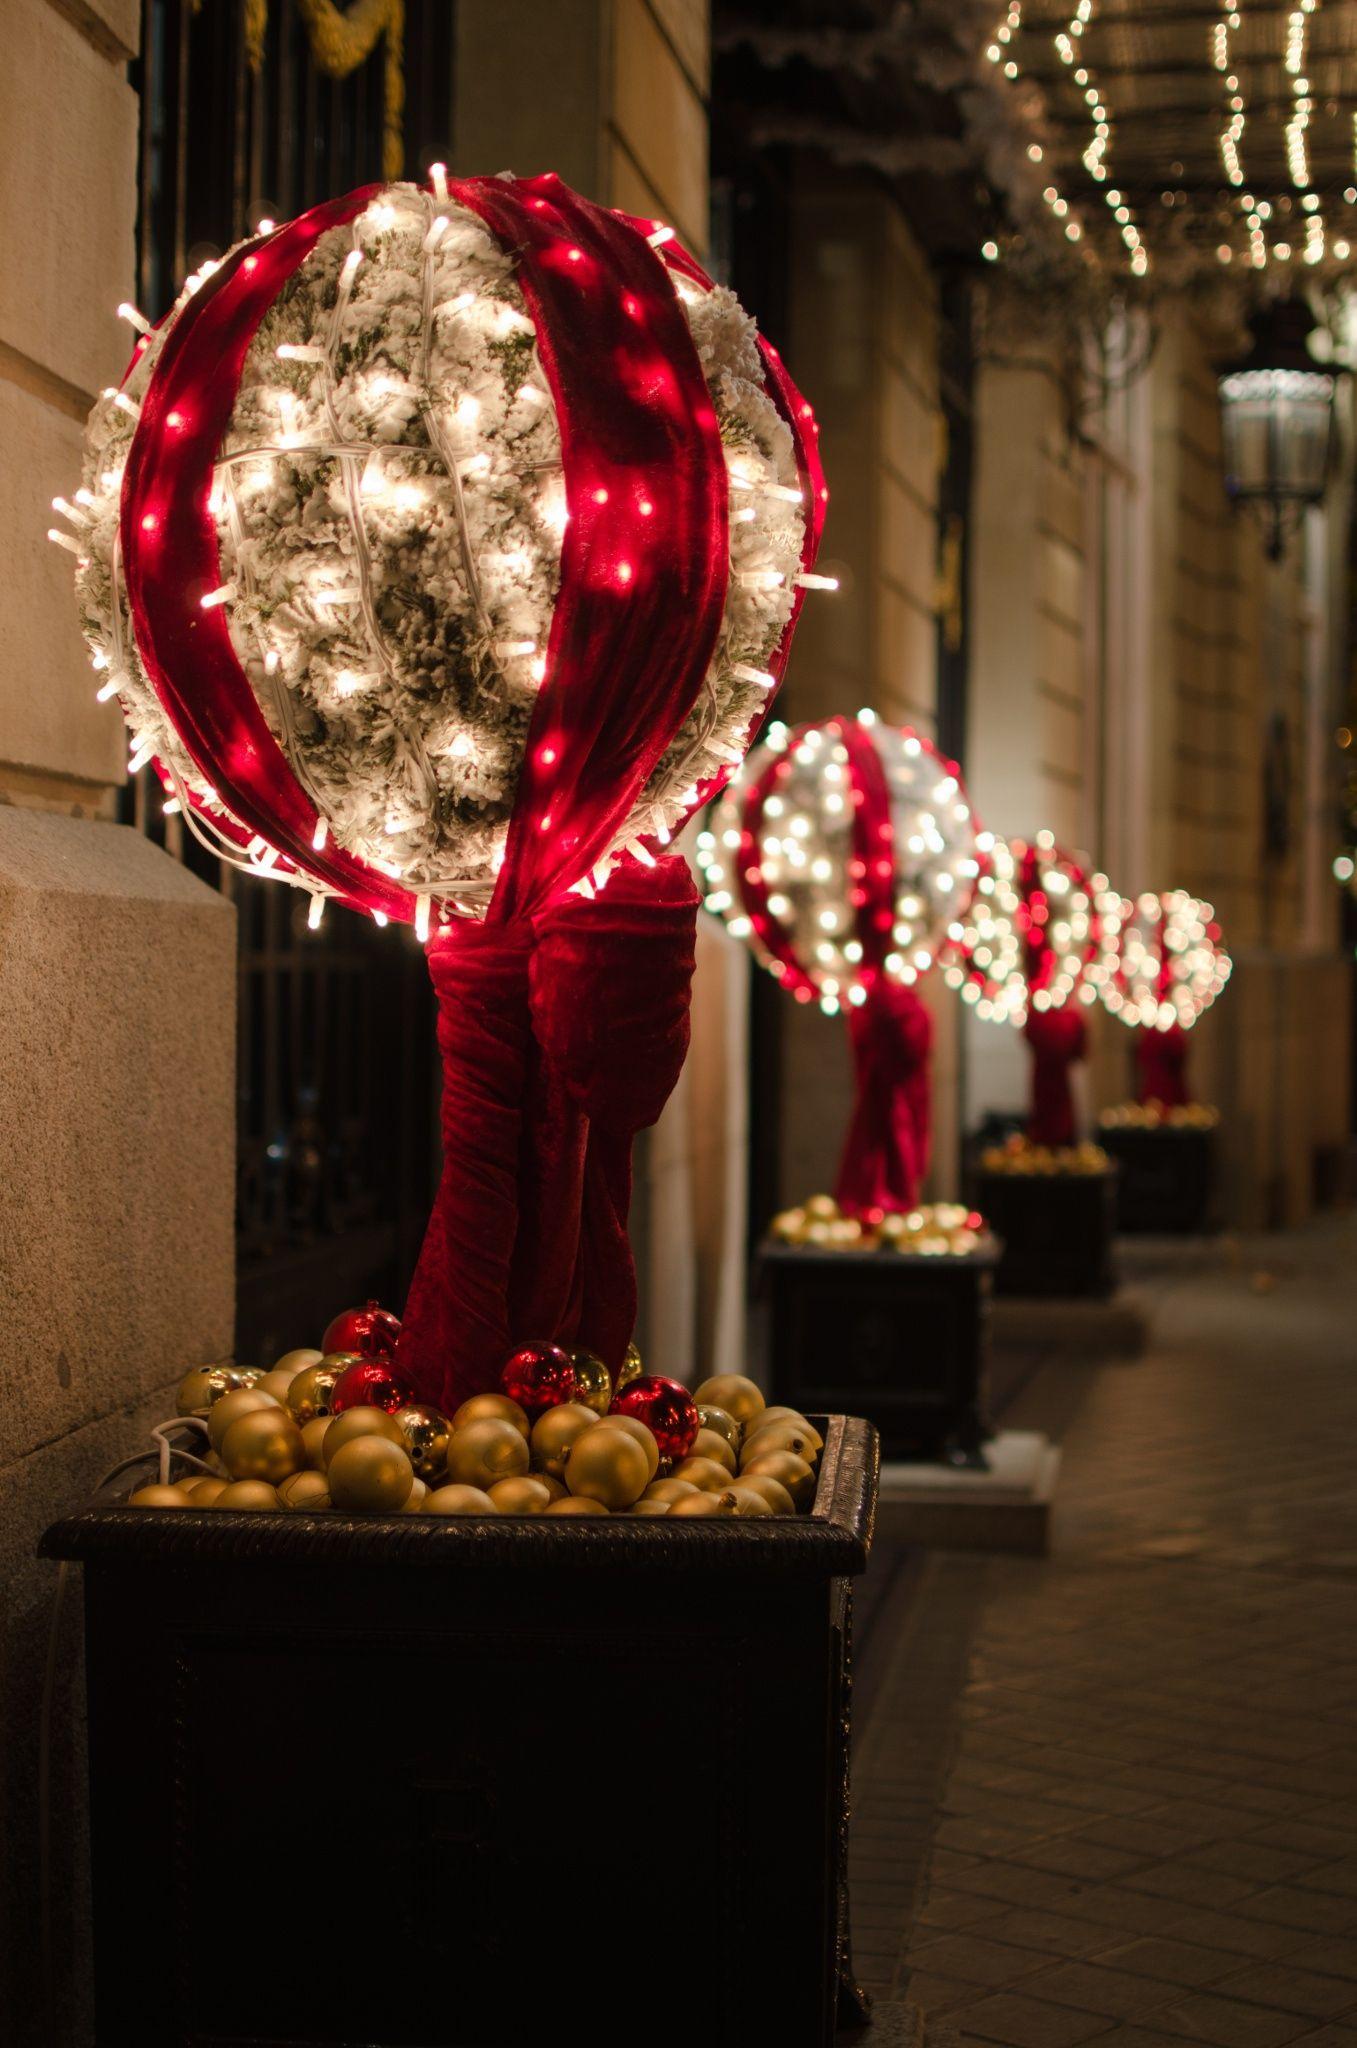 Christmas lights by walter degirolmo on 500px outdoor